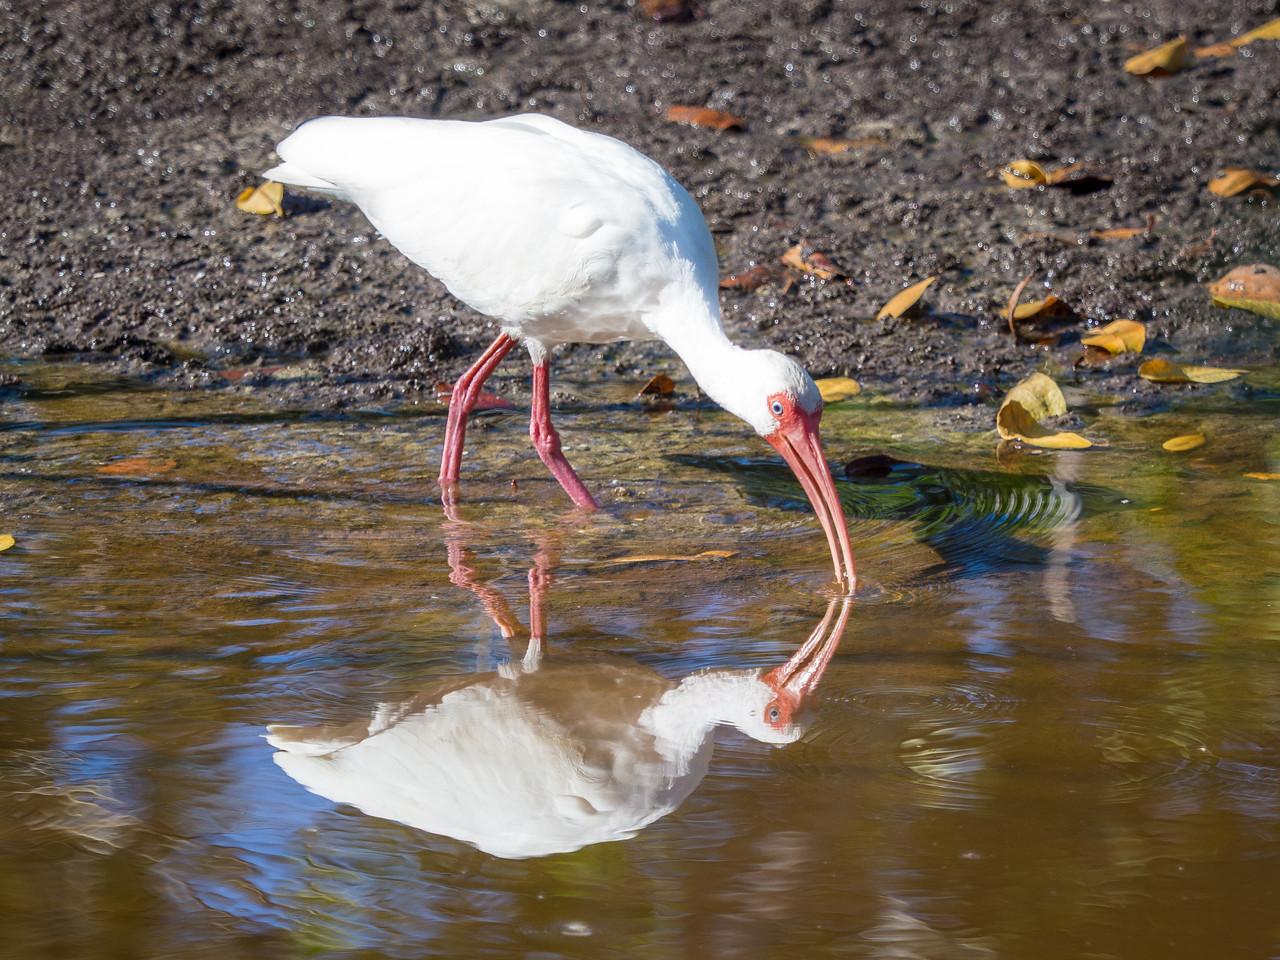 Ibis. Ding Darling Wildlife Refuge, Sanibel Island, FL